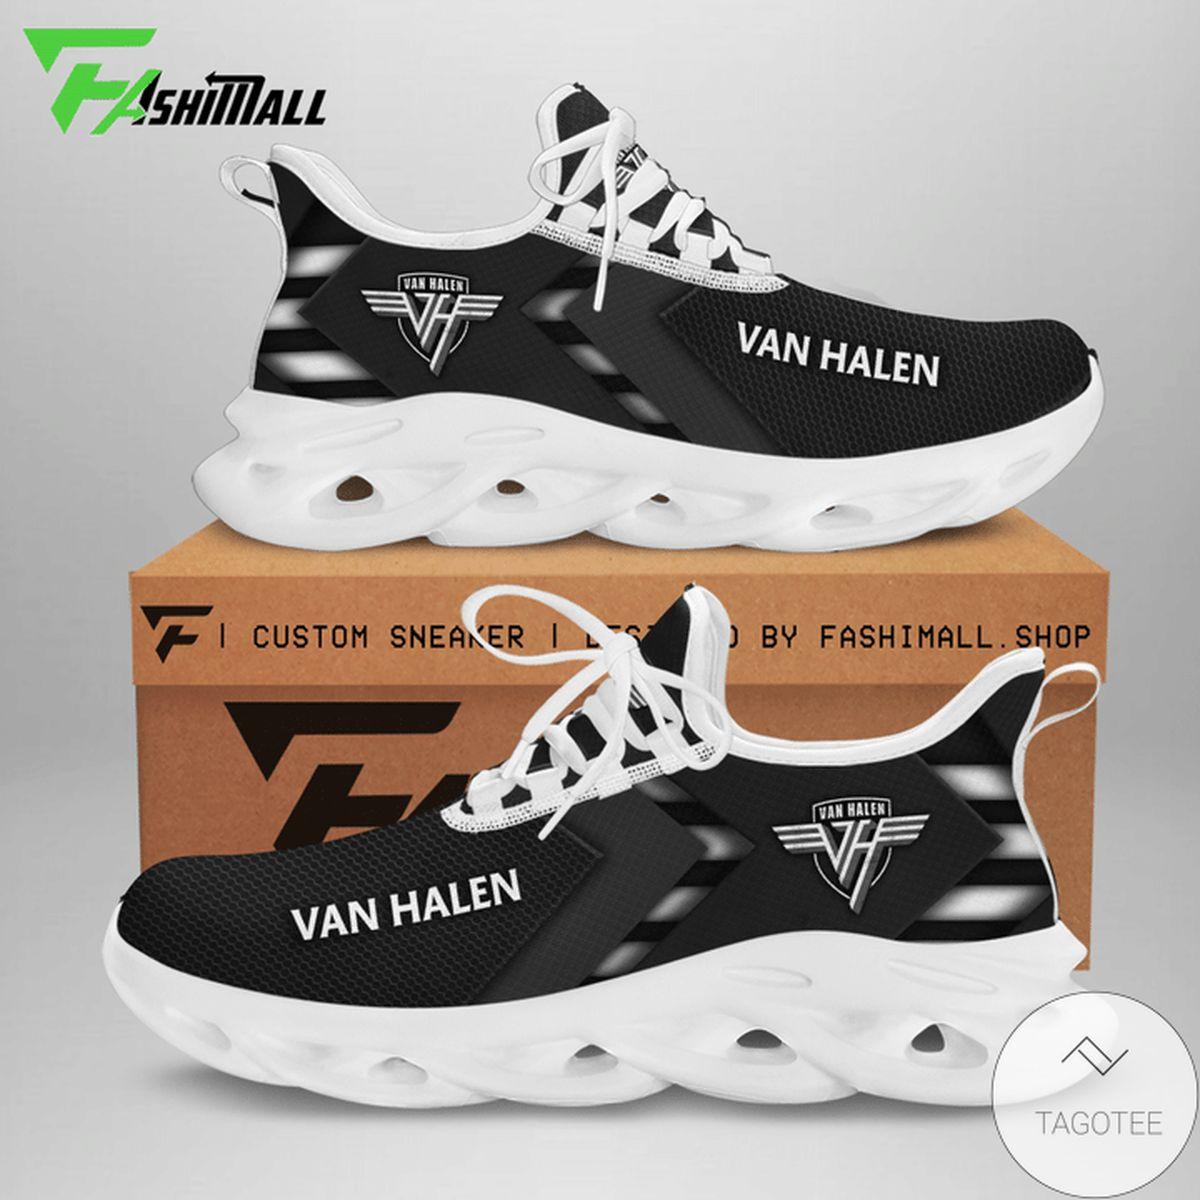 Awesome Van Halen All Black Sneaker Max Soul Shoes